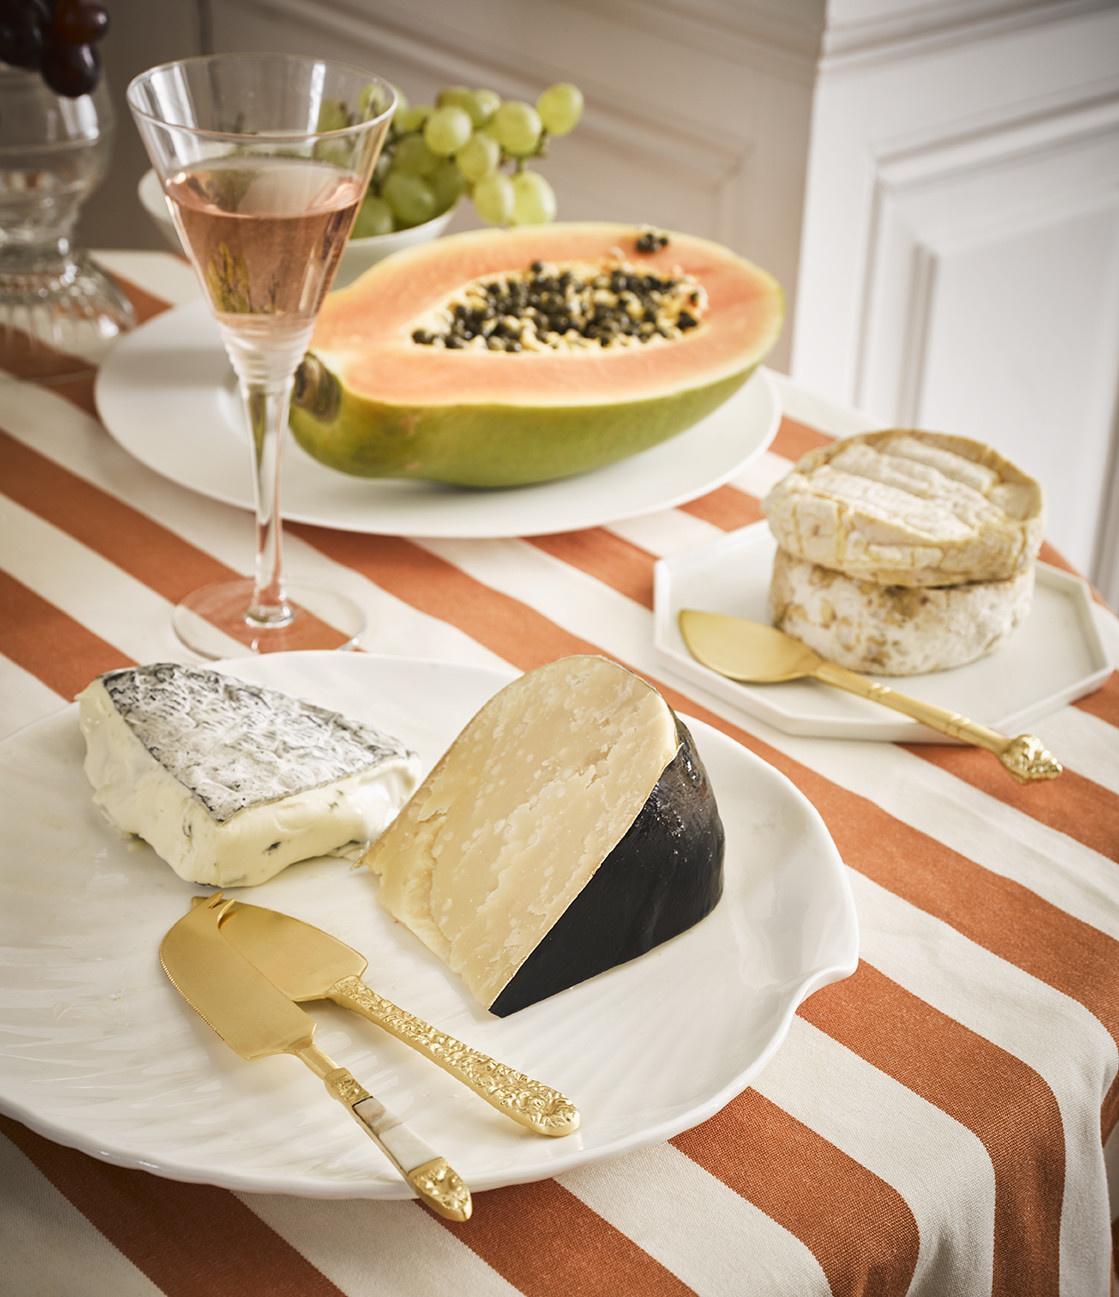 Bestek cheese set of 3 Gold-2